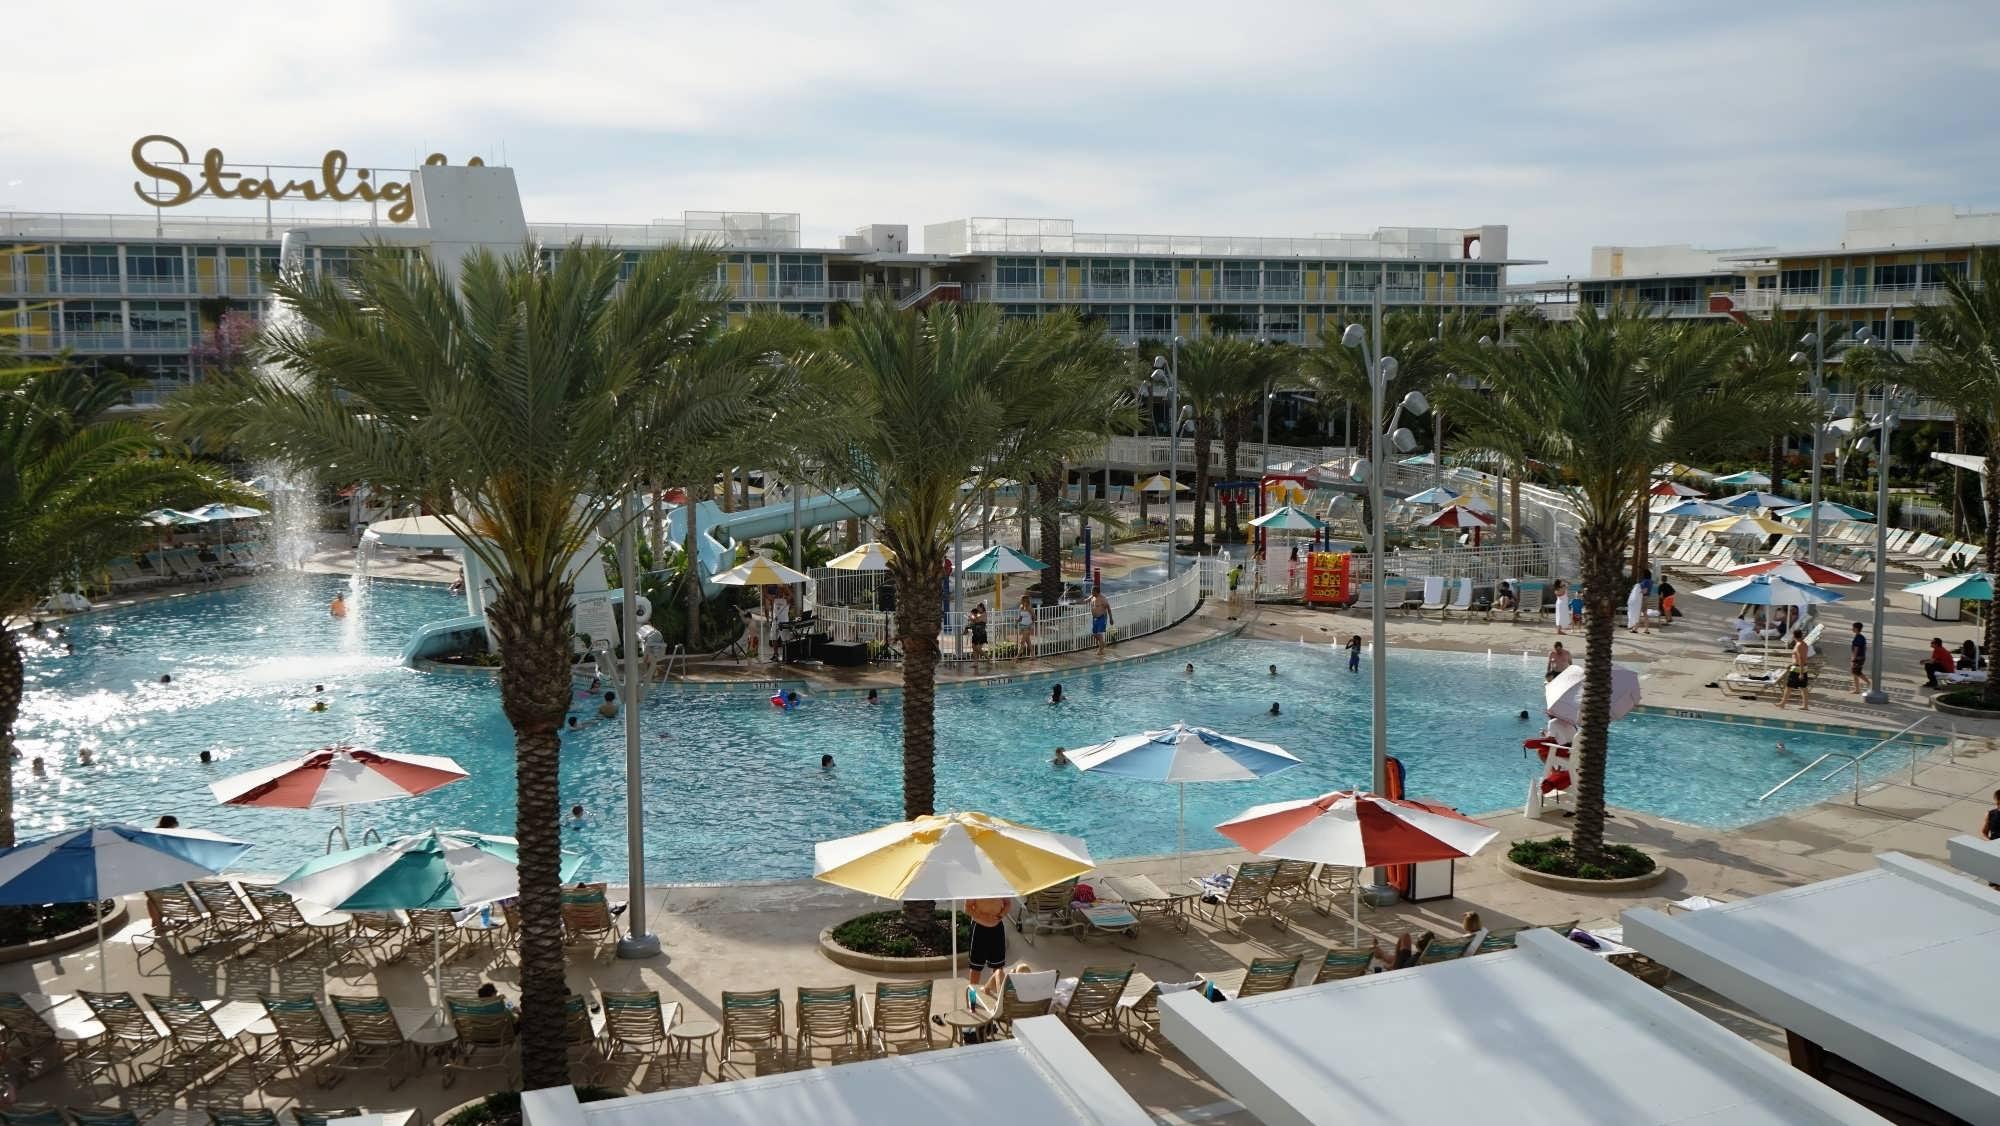 Cabana Bay Beach Resort The thrills of staying at